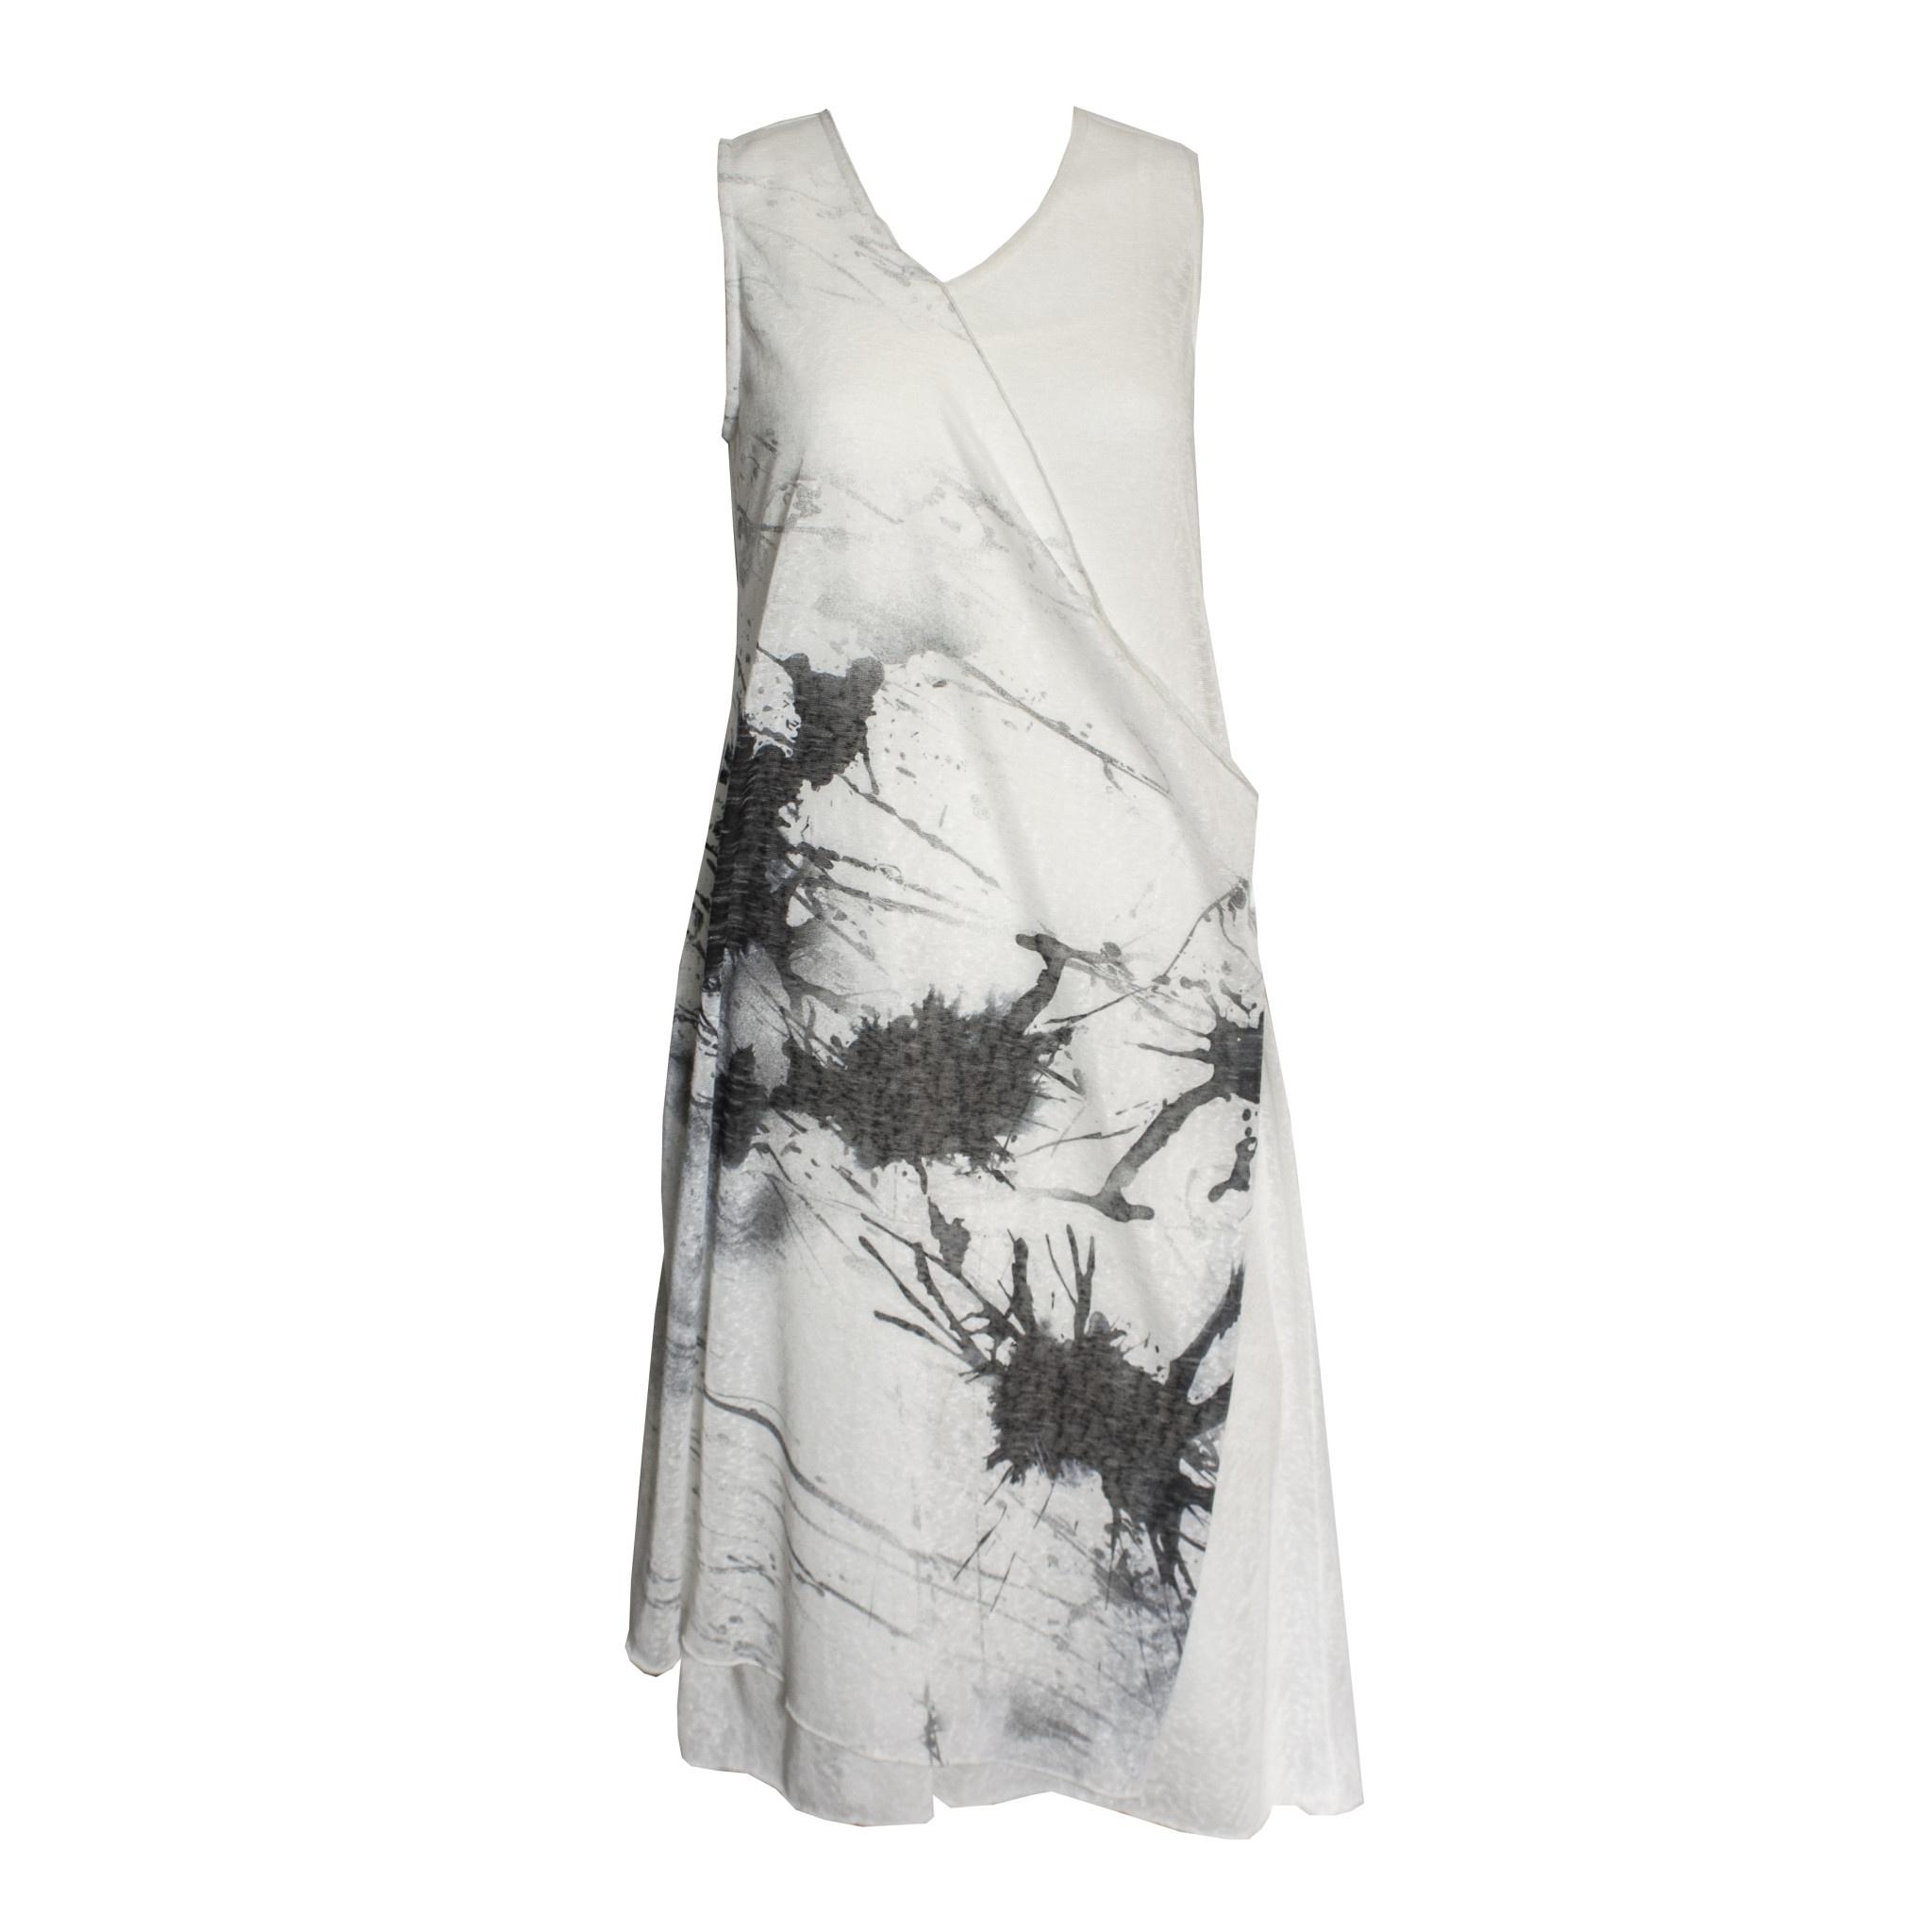 Ingrid Munt Ingrid Munt Canvas Print Sleeveless Dress - White